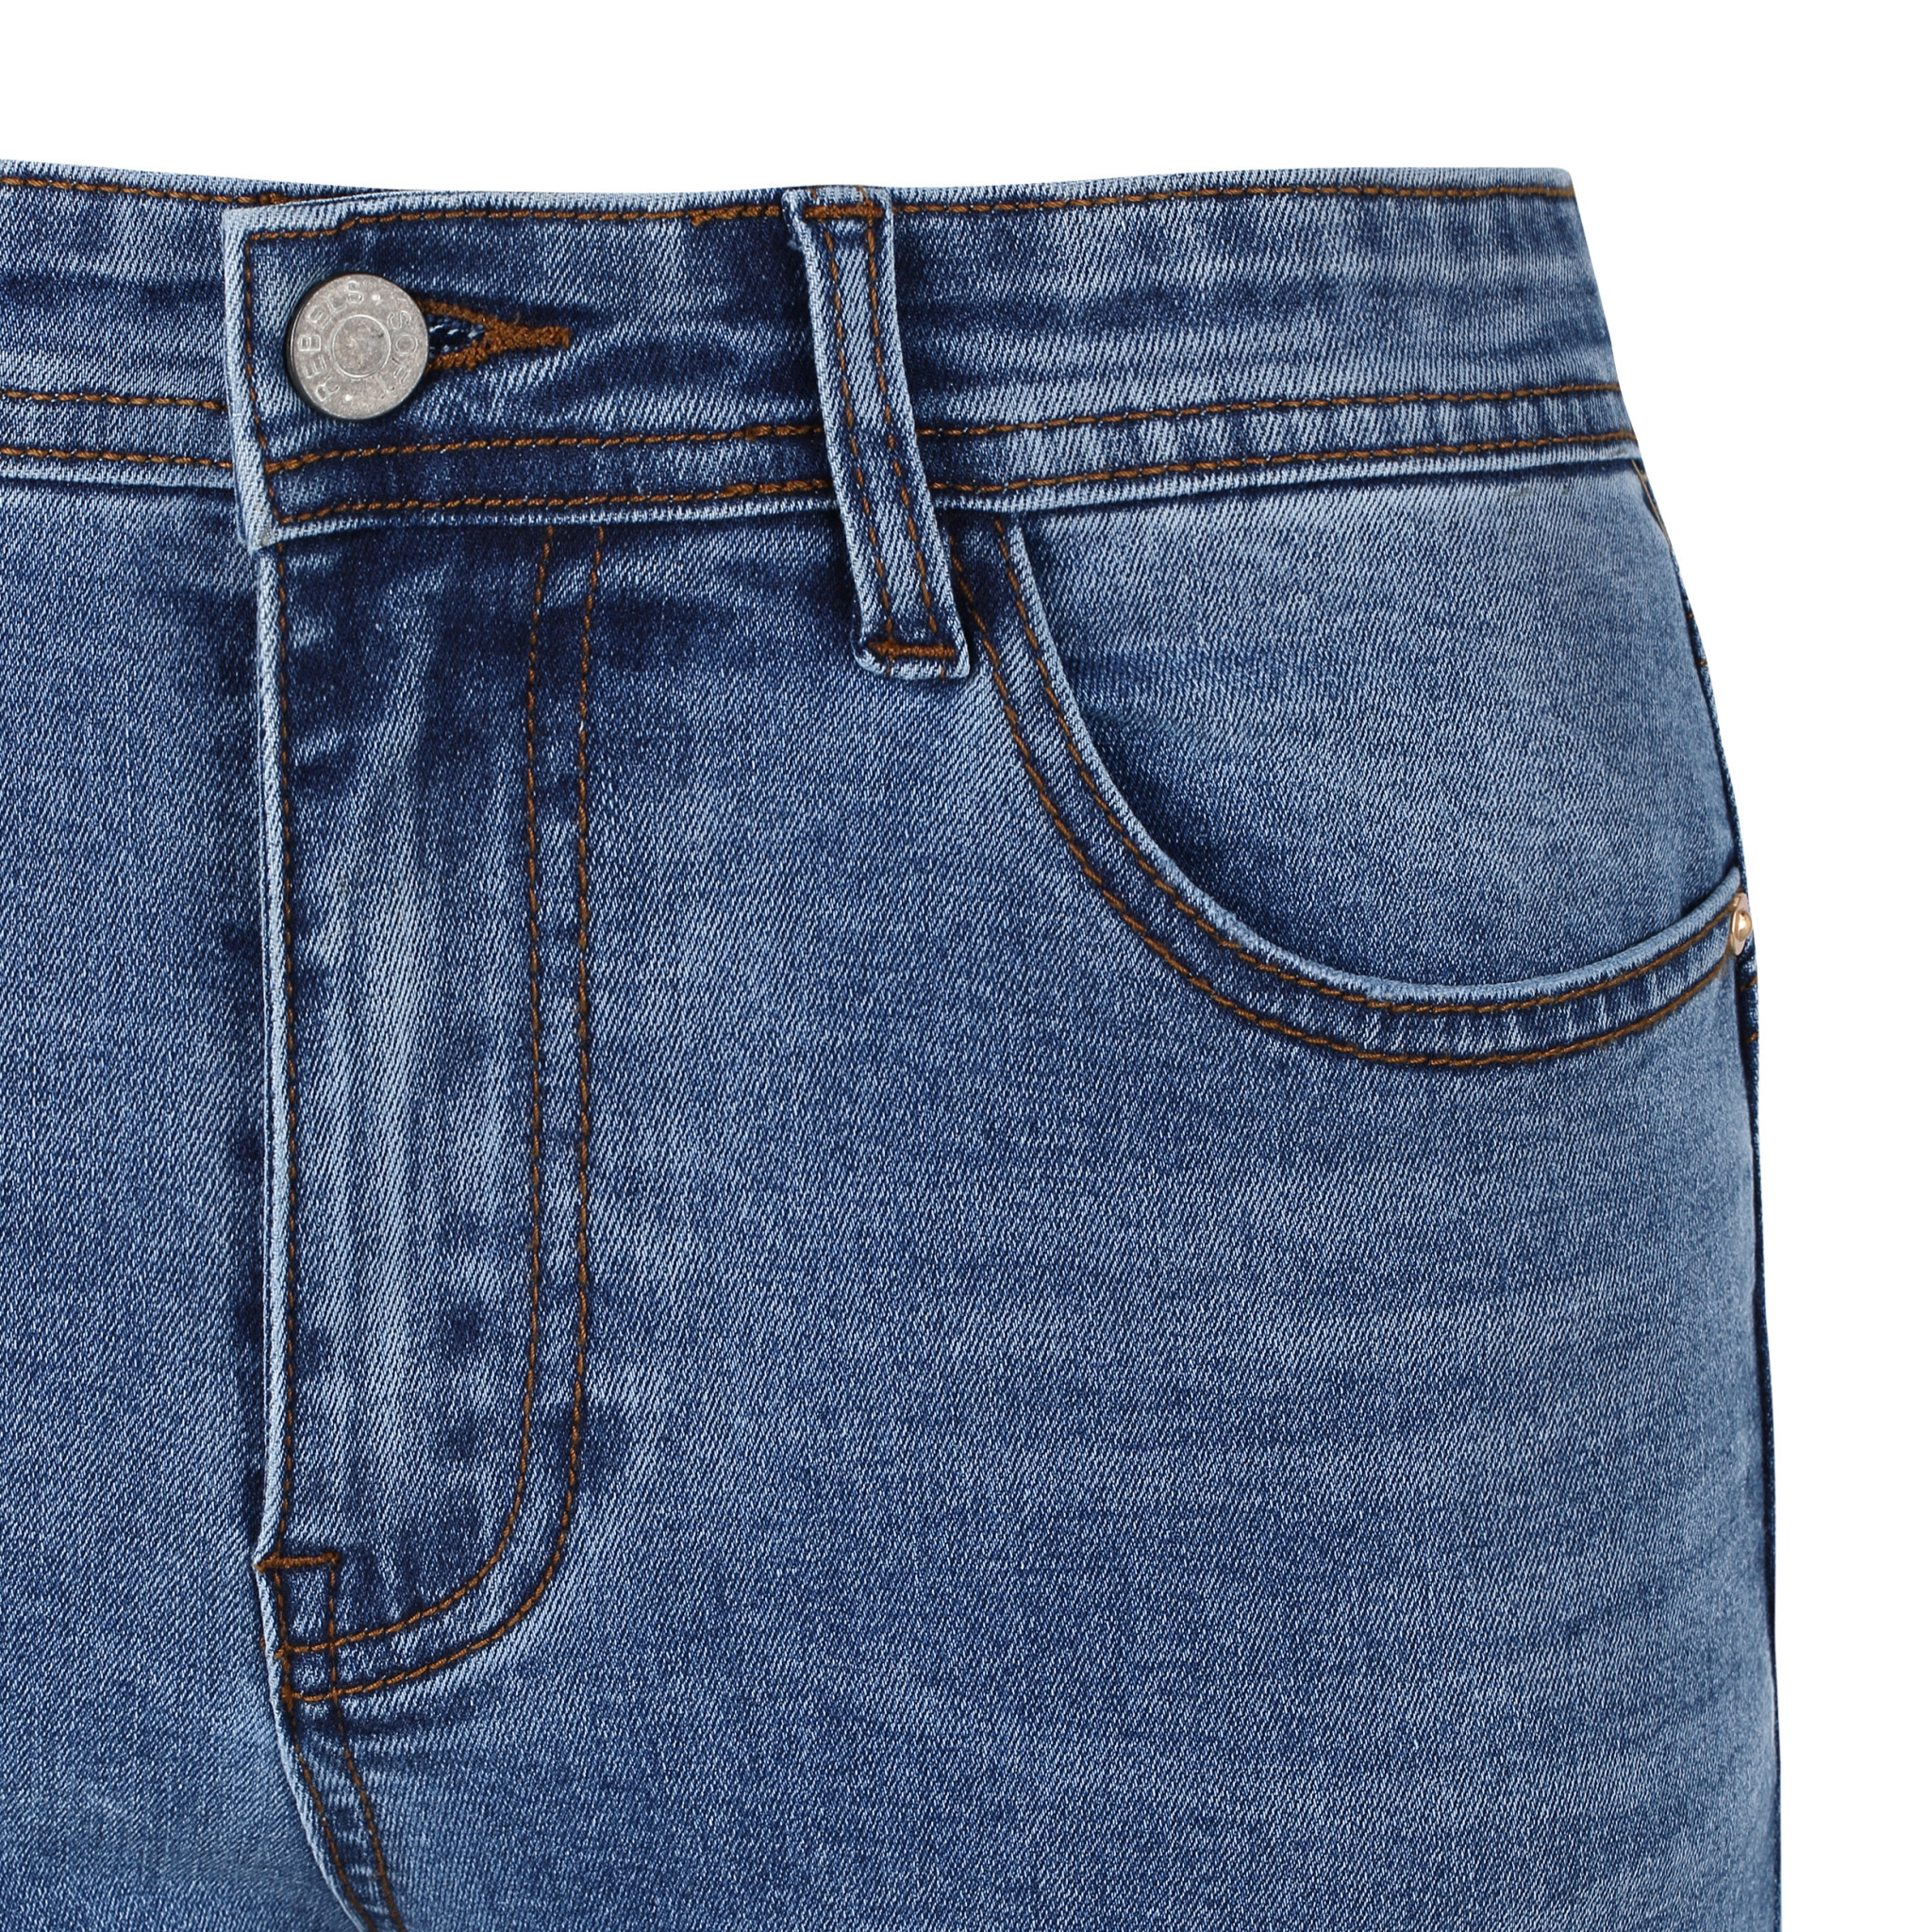 Soft Rebels Mid Rise Slim Jeans - Medium Blue Wash - 806